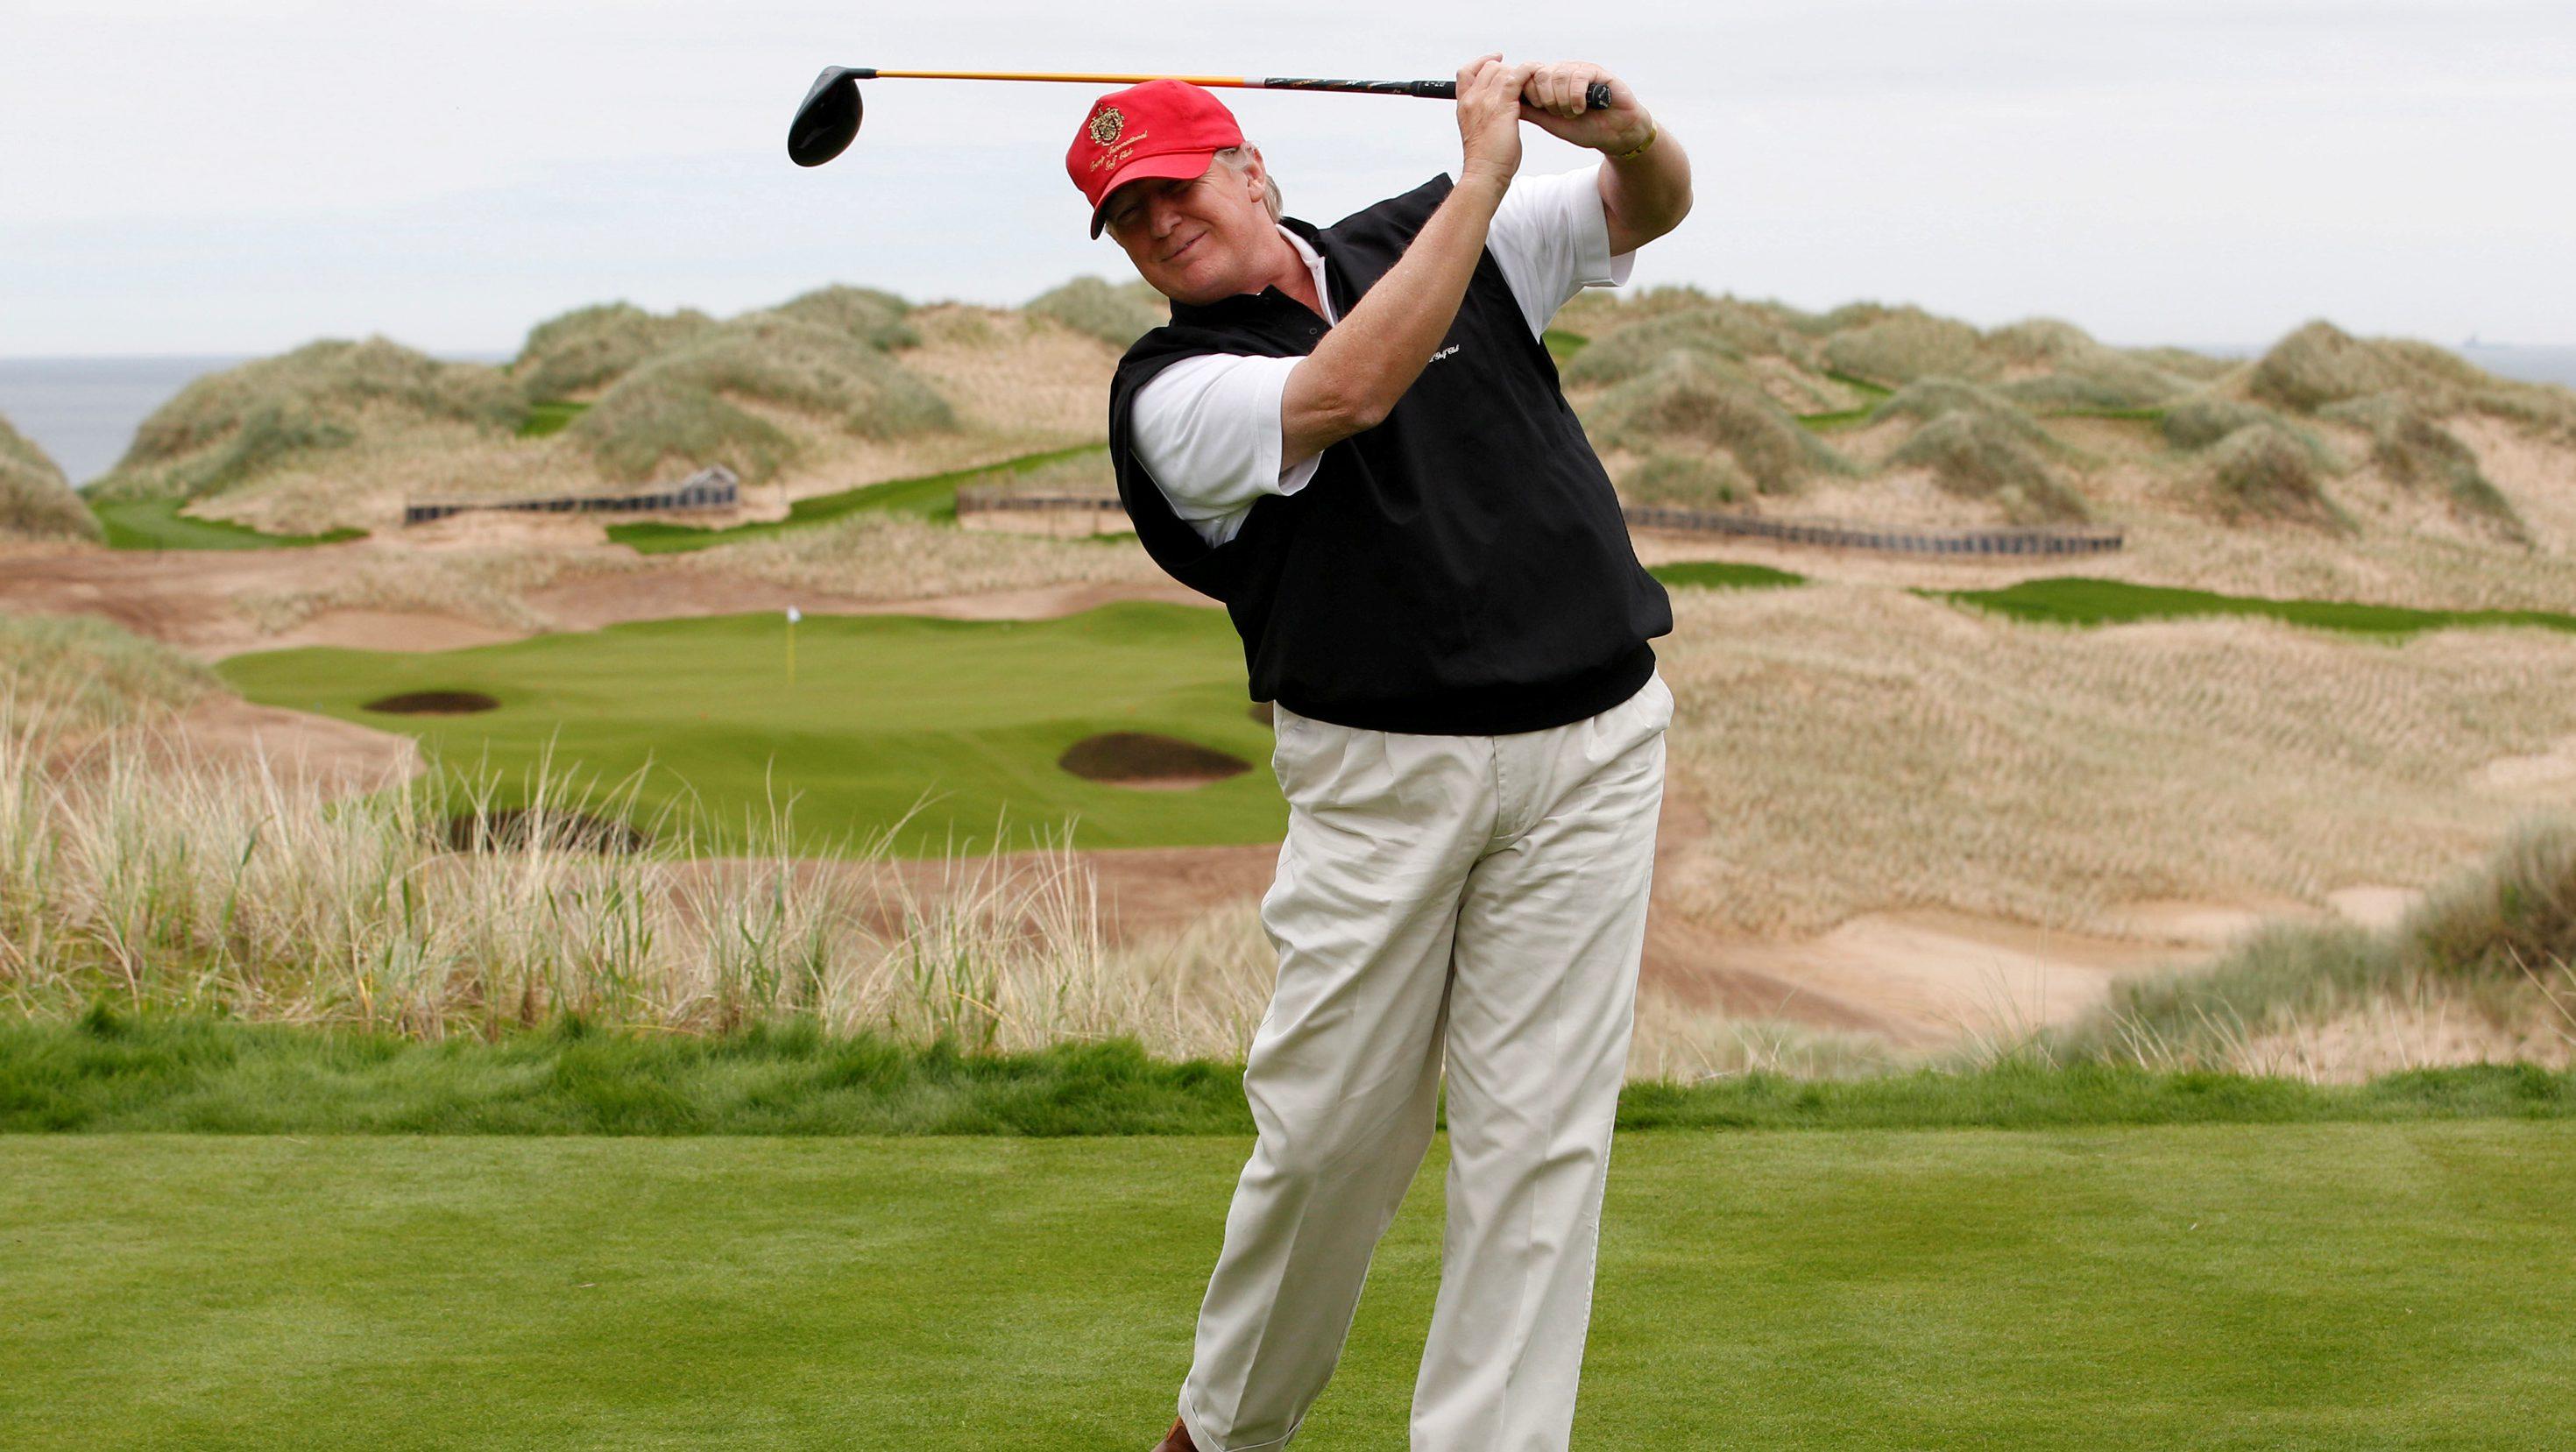 Donald Trump swings a golf club in Scotland.